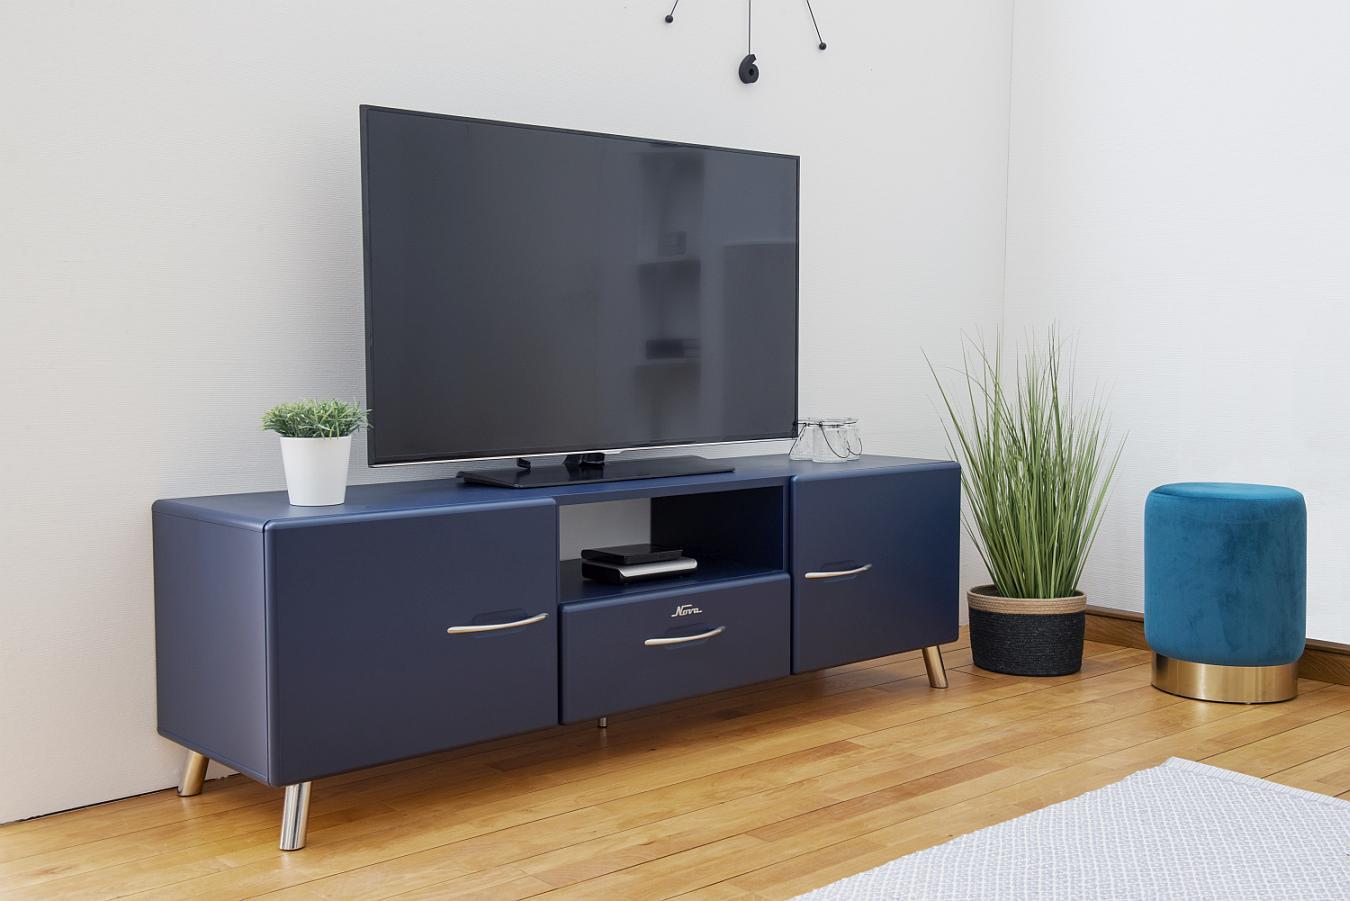 Tenzo Nova TV-Meubel 2-Deurs/1-Lade - 168x43x51 - Mat Blauw